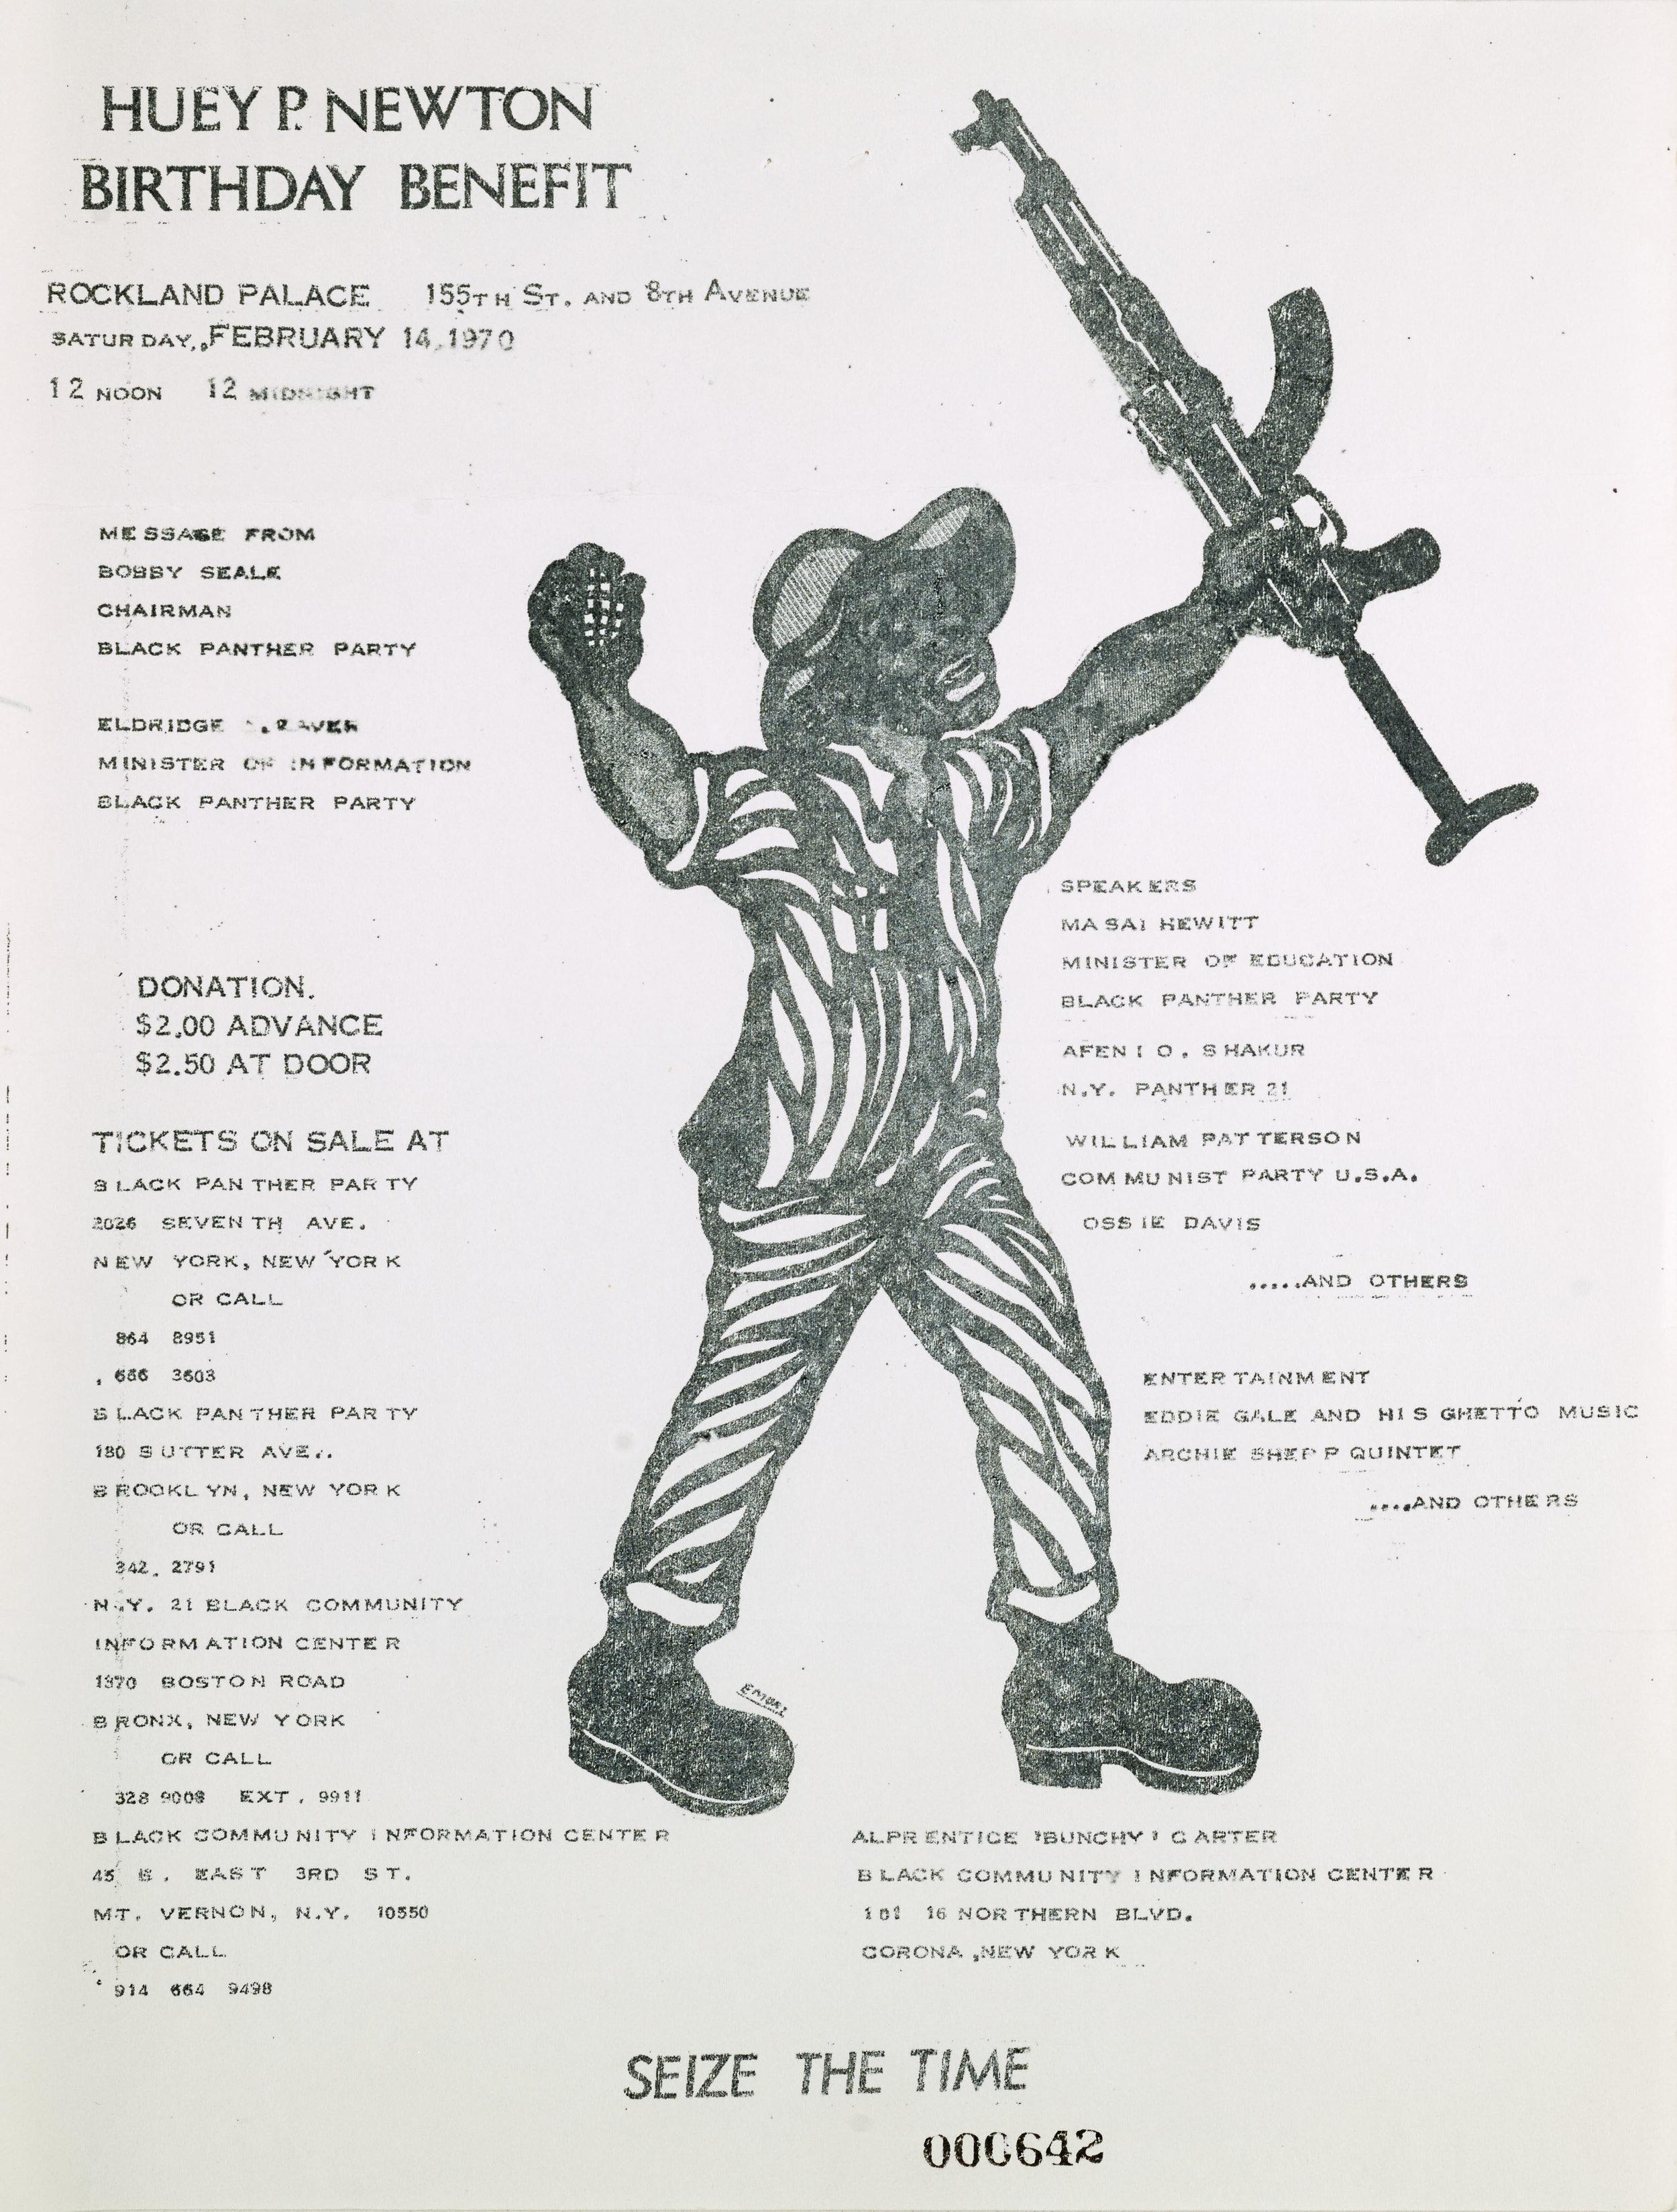 Huey Newton Birthday benefit, February 14, 1970